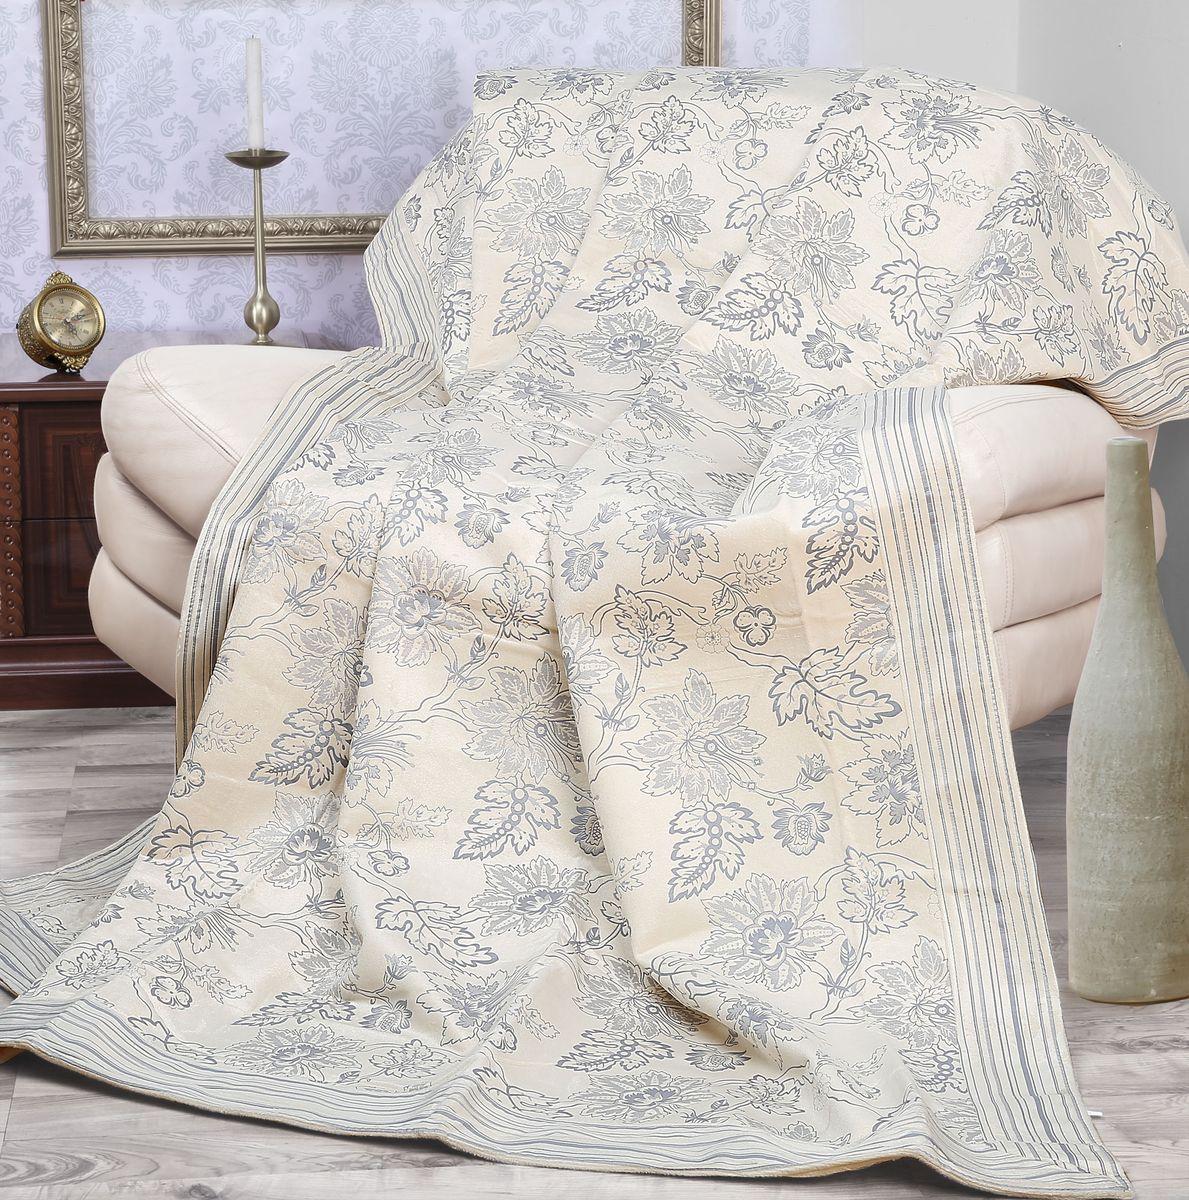 Покрывало Mona Liza Elite Camelia, цвет: бежевый, серый, 200 х 220 см